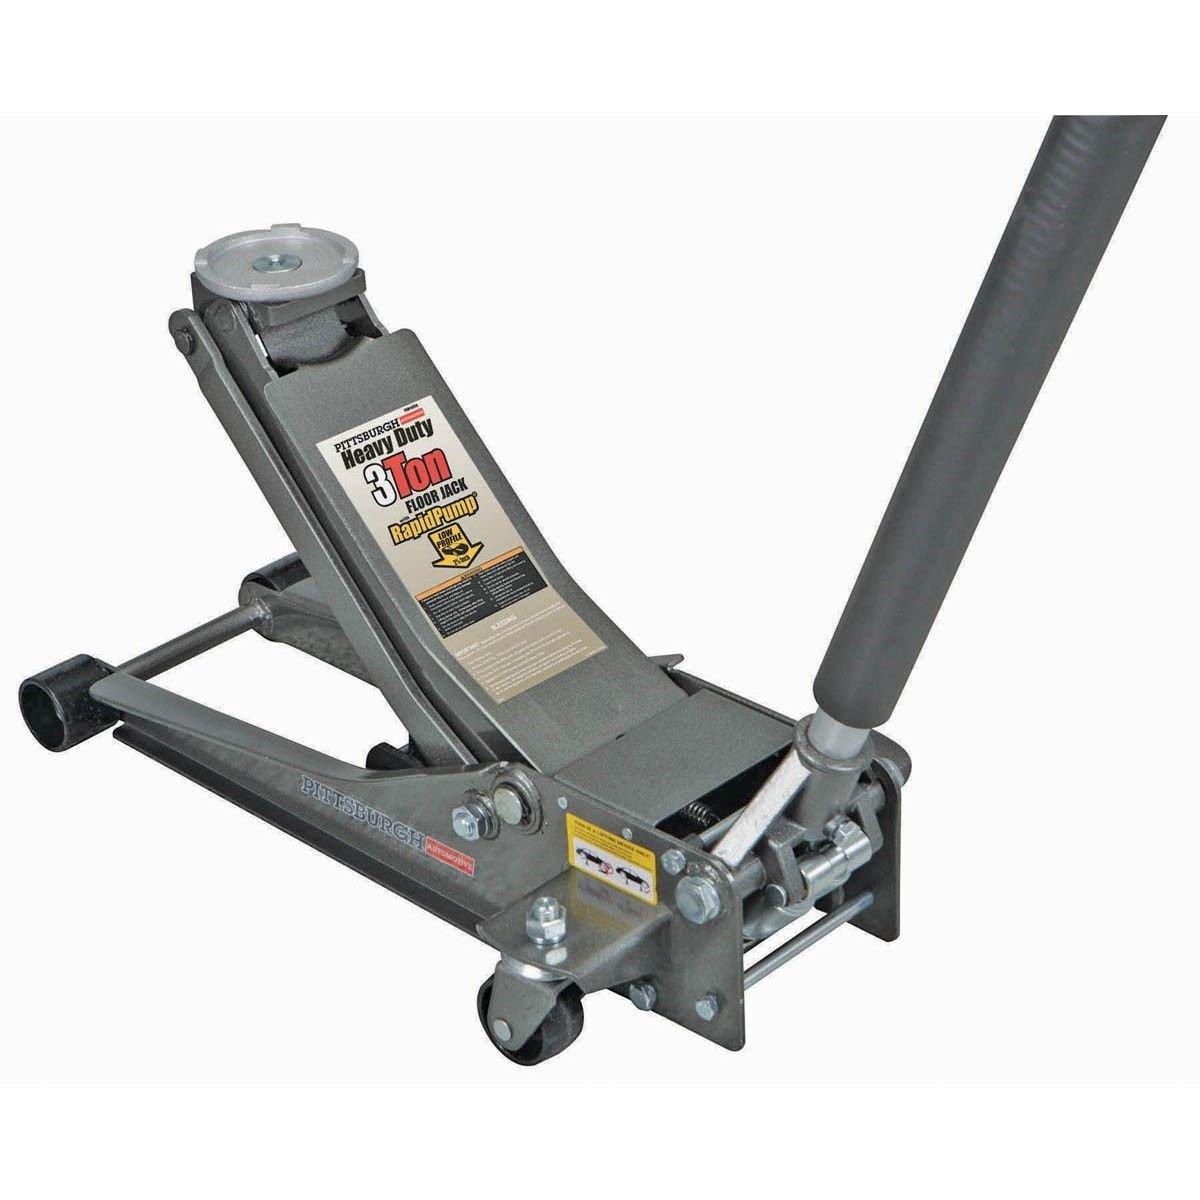 Eight24hours 3 Ton Heavy Duty Steel Ultra LOW PROFILE Floor Jack Rapid Pump Show Car Lowrider - L5